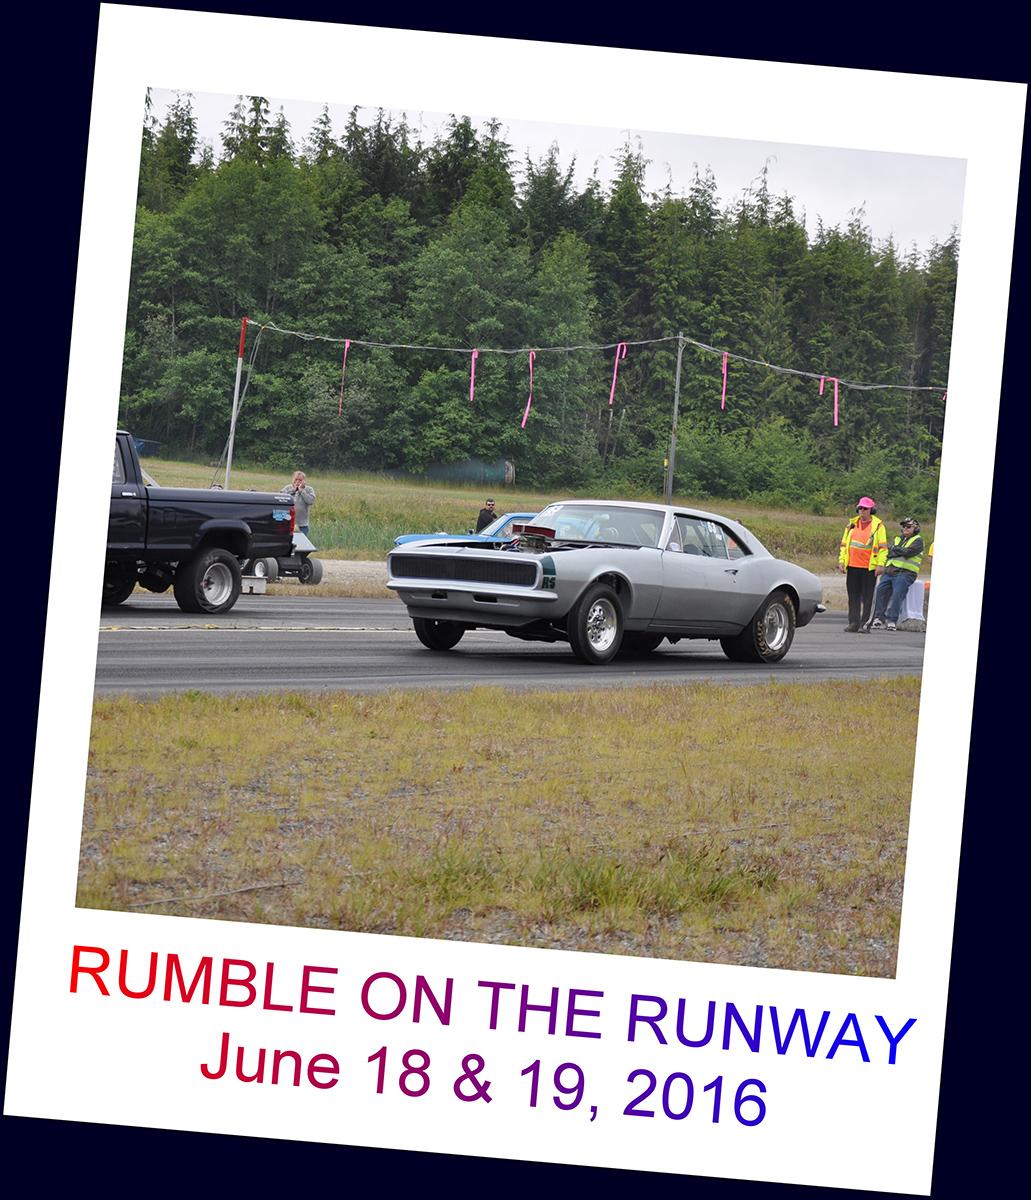 Rumble on the Runway June 18 & 19, 2016 1178